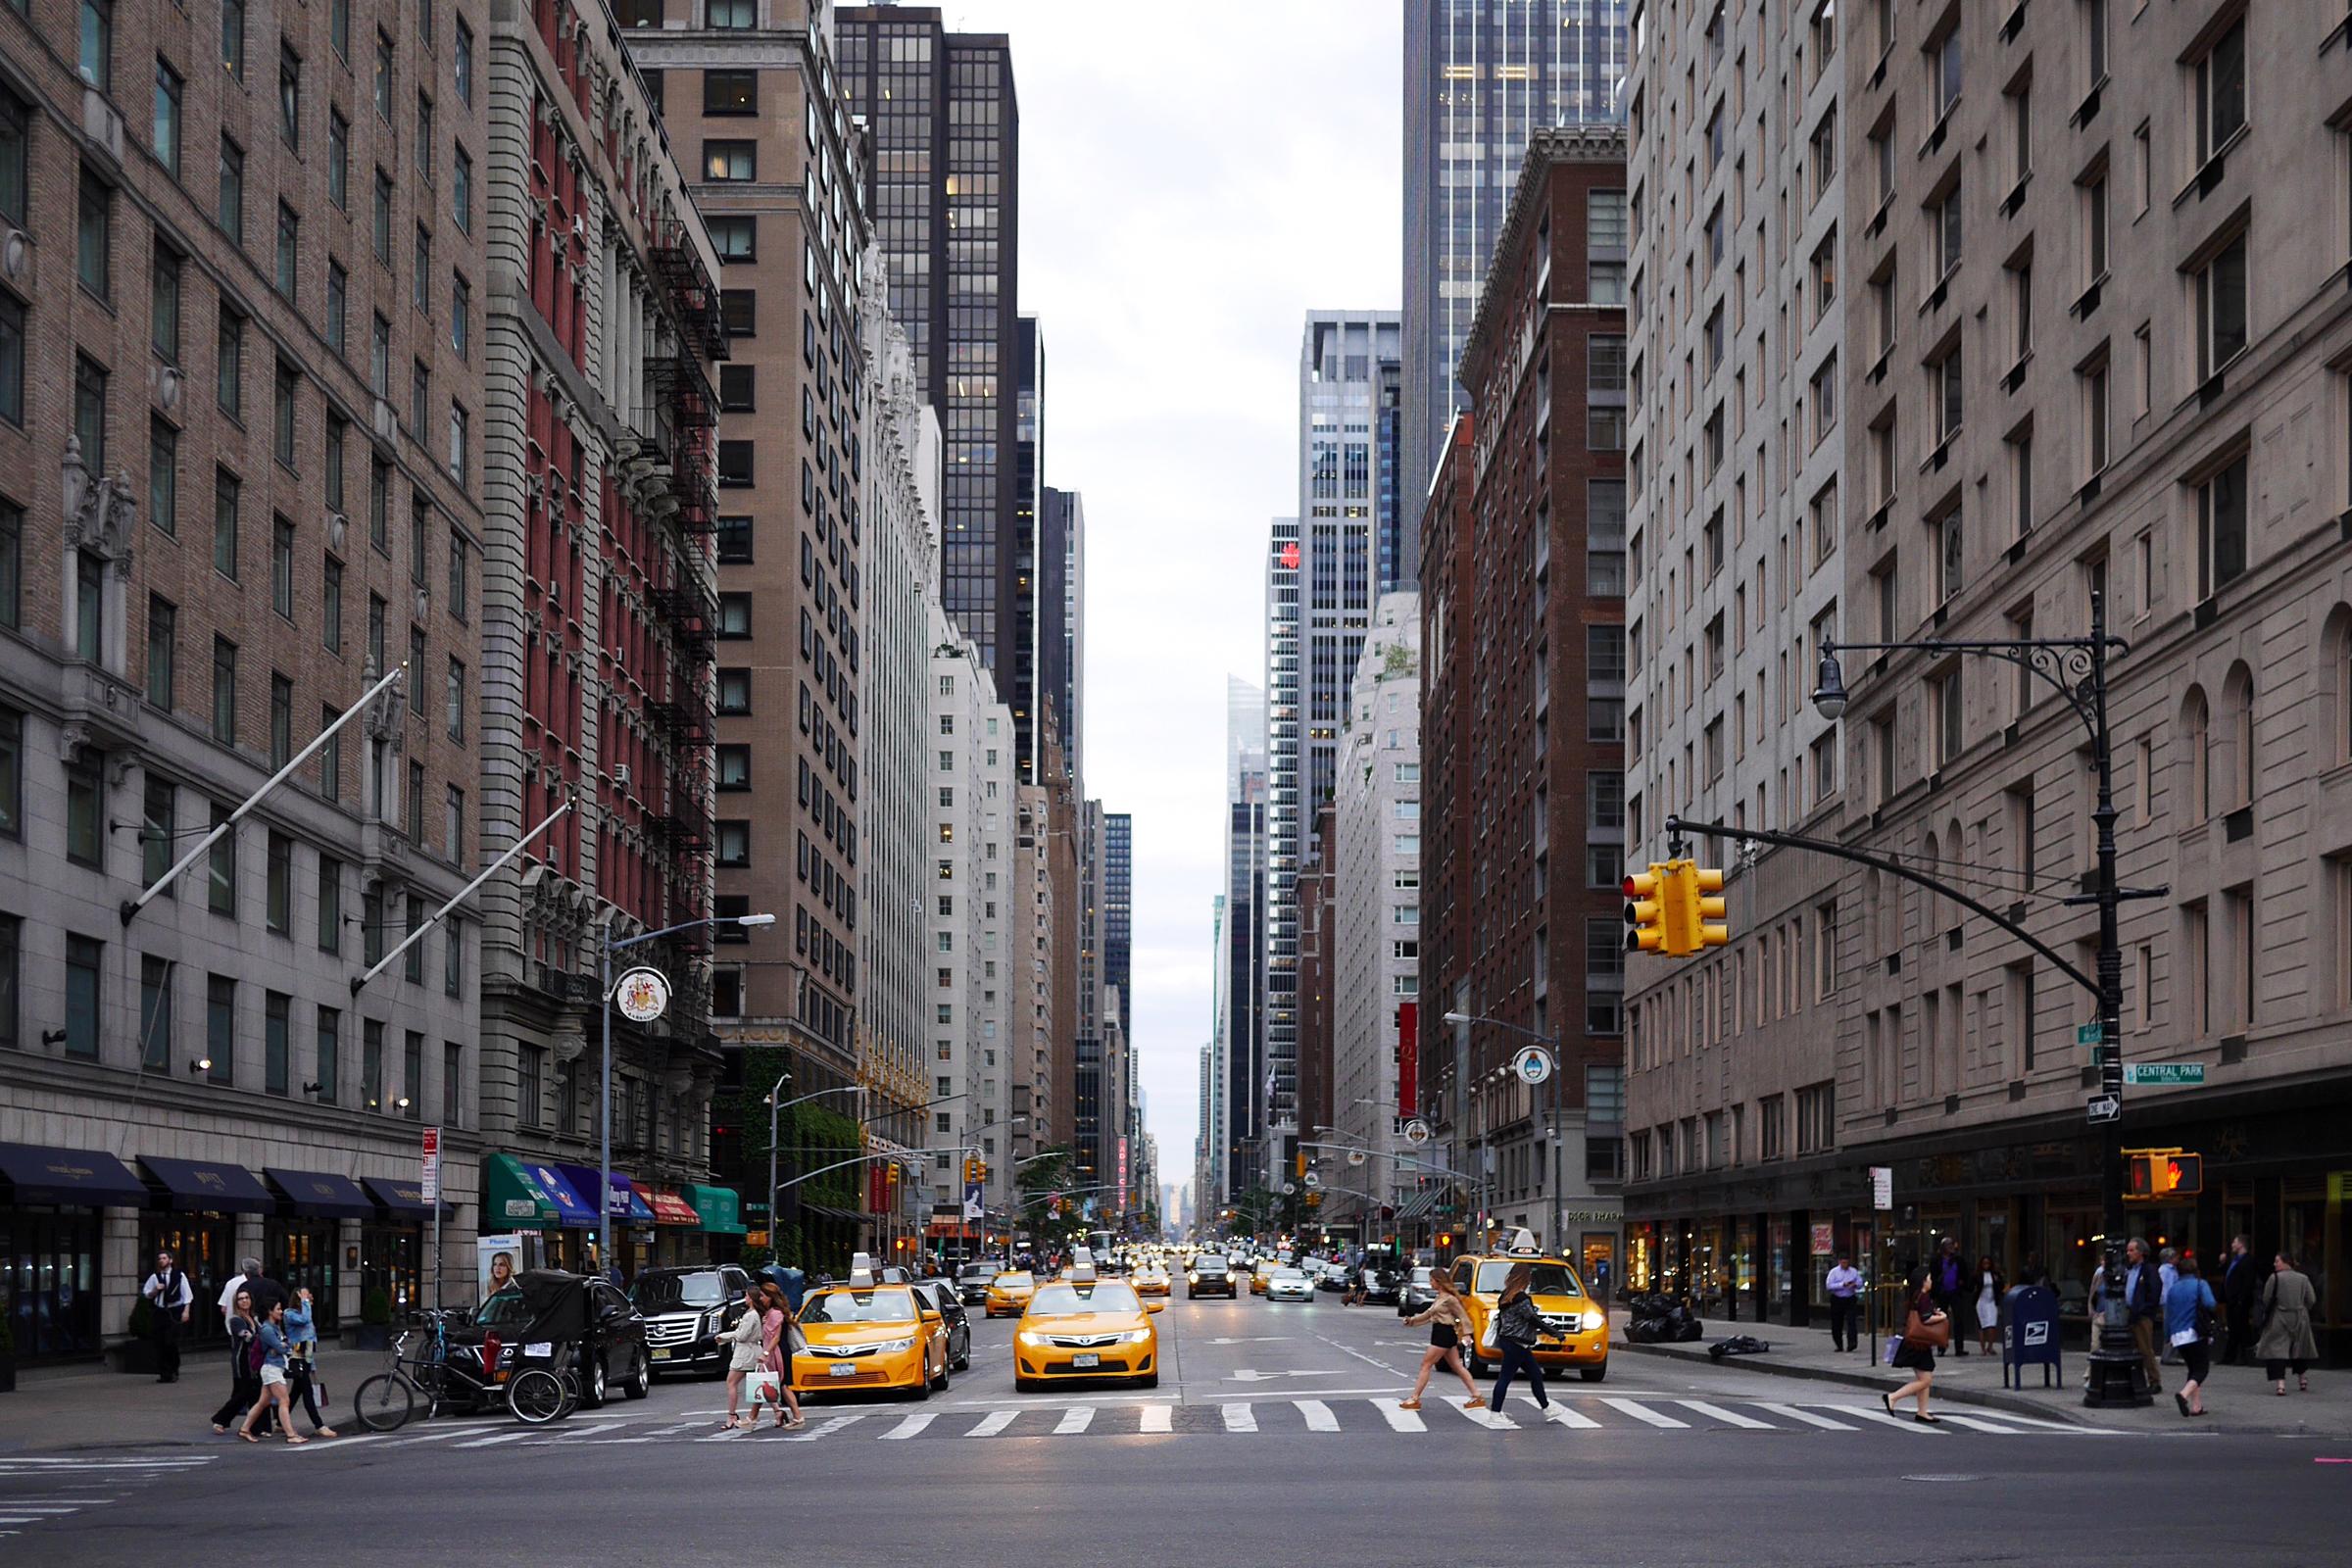 NY旅行記7 コロンバスサークルと5番街 – Capture Your Life